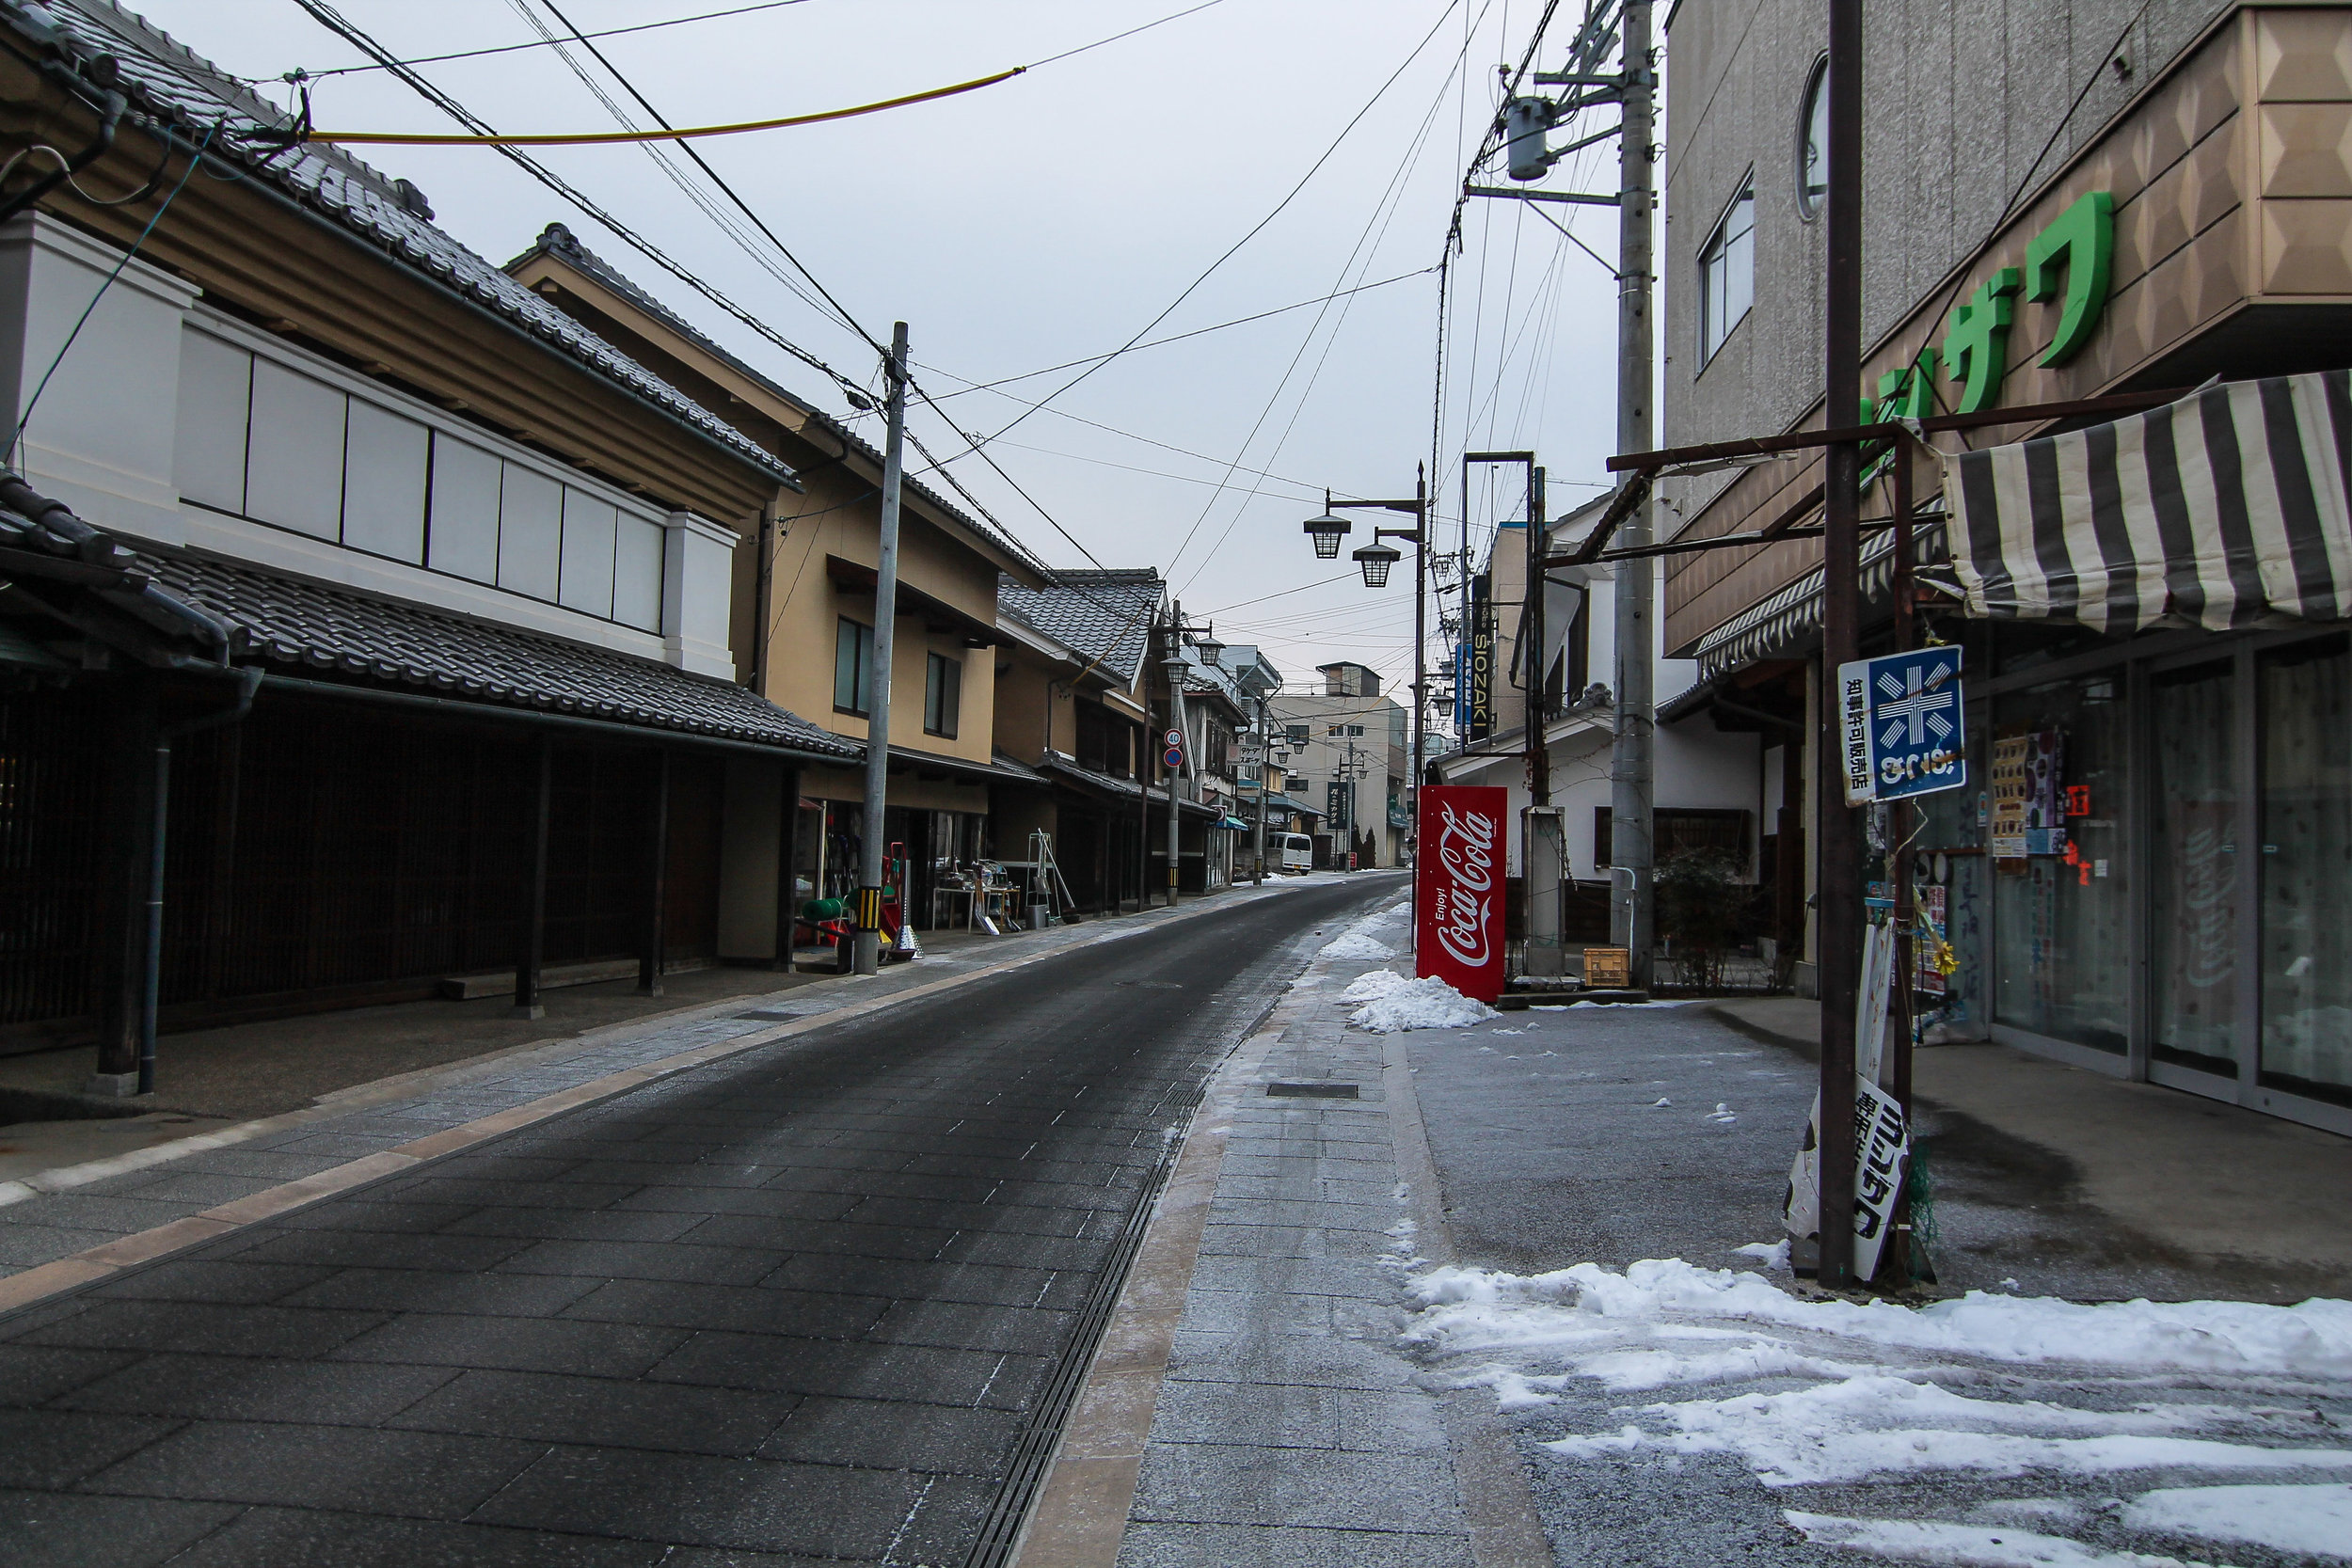 The streets of Suzaka